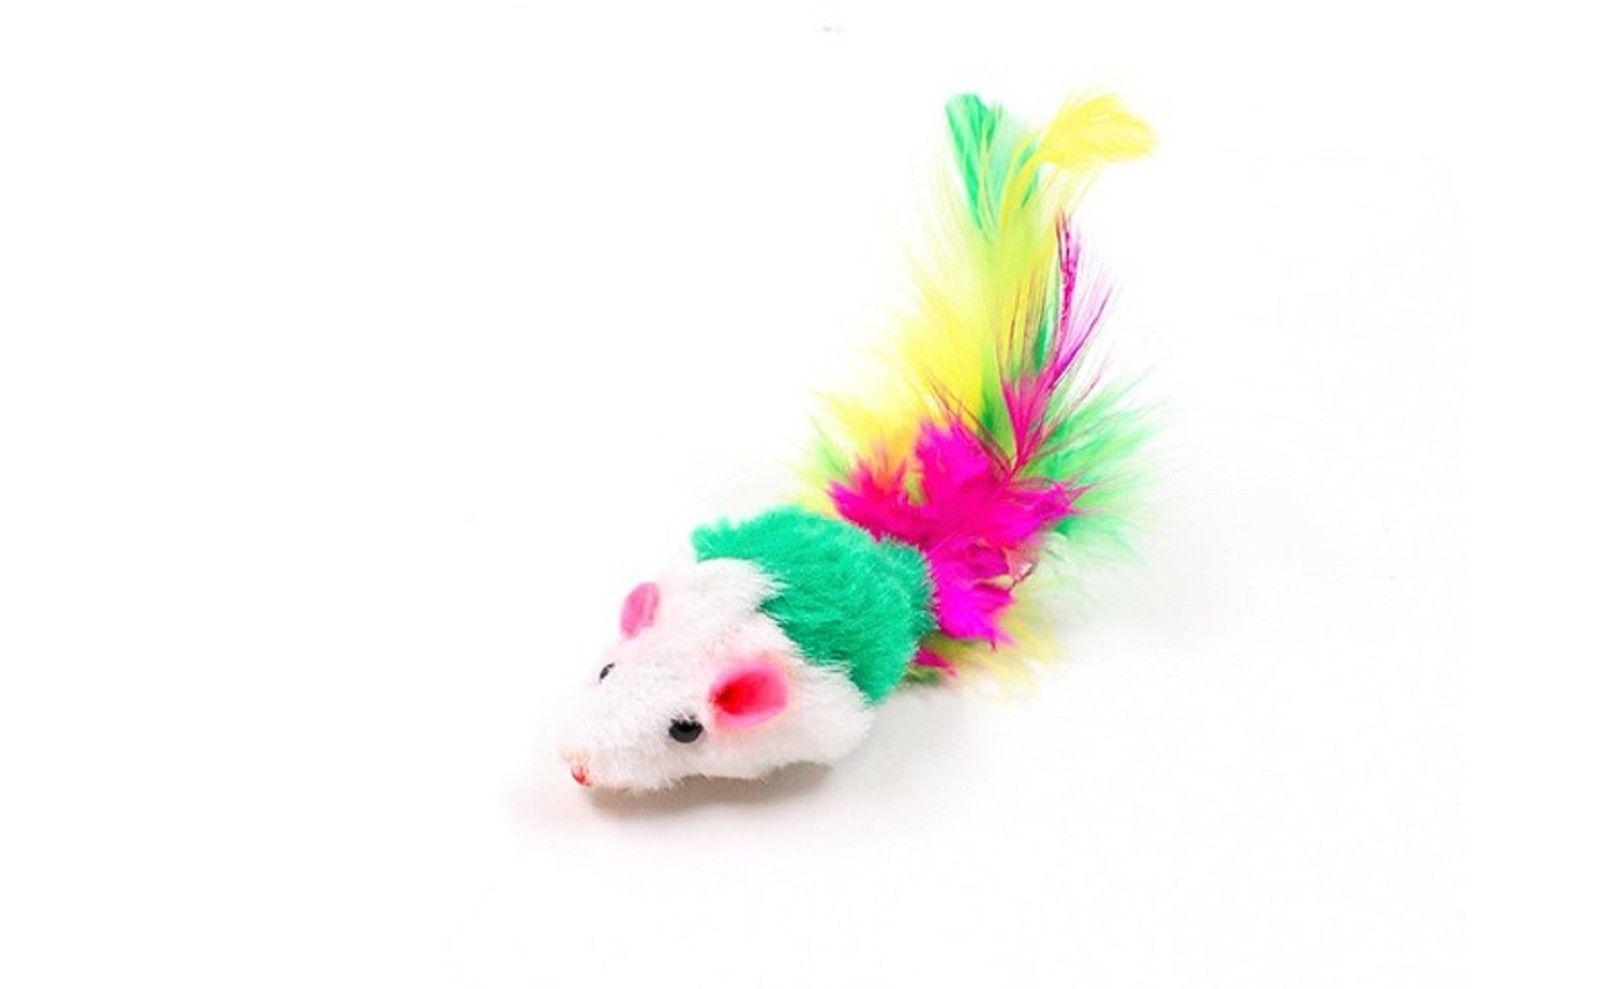 Fur Cat Toys, Soft Play Catnip for 10